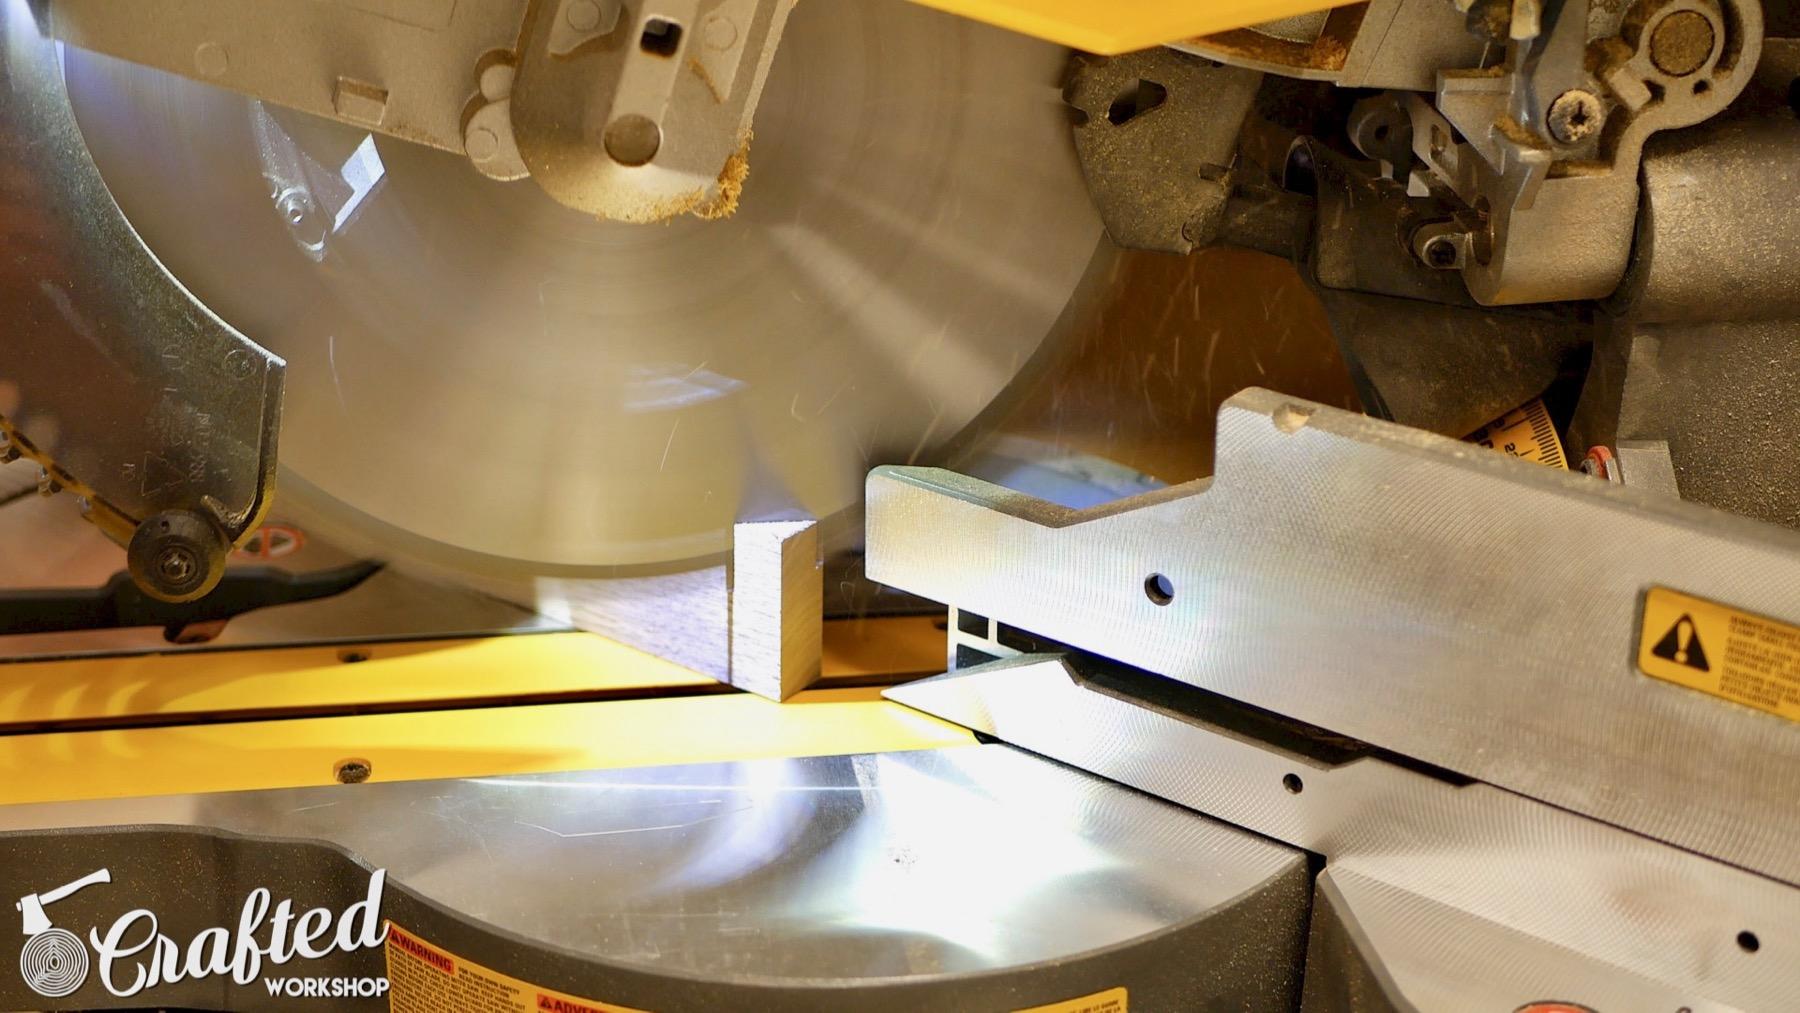 DIY Light Box Sign How-To Build dewalt flexvolt miter saw bevel walnut